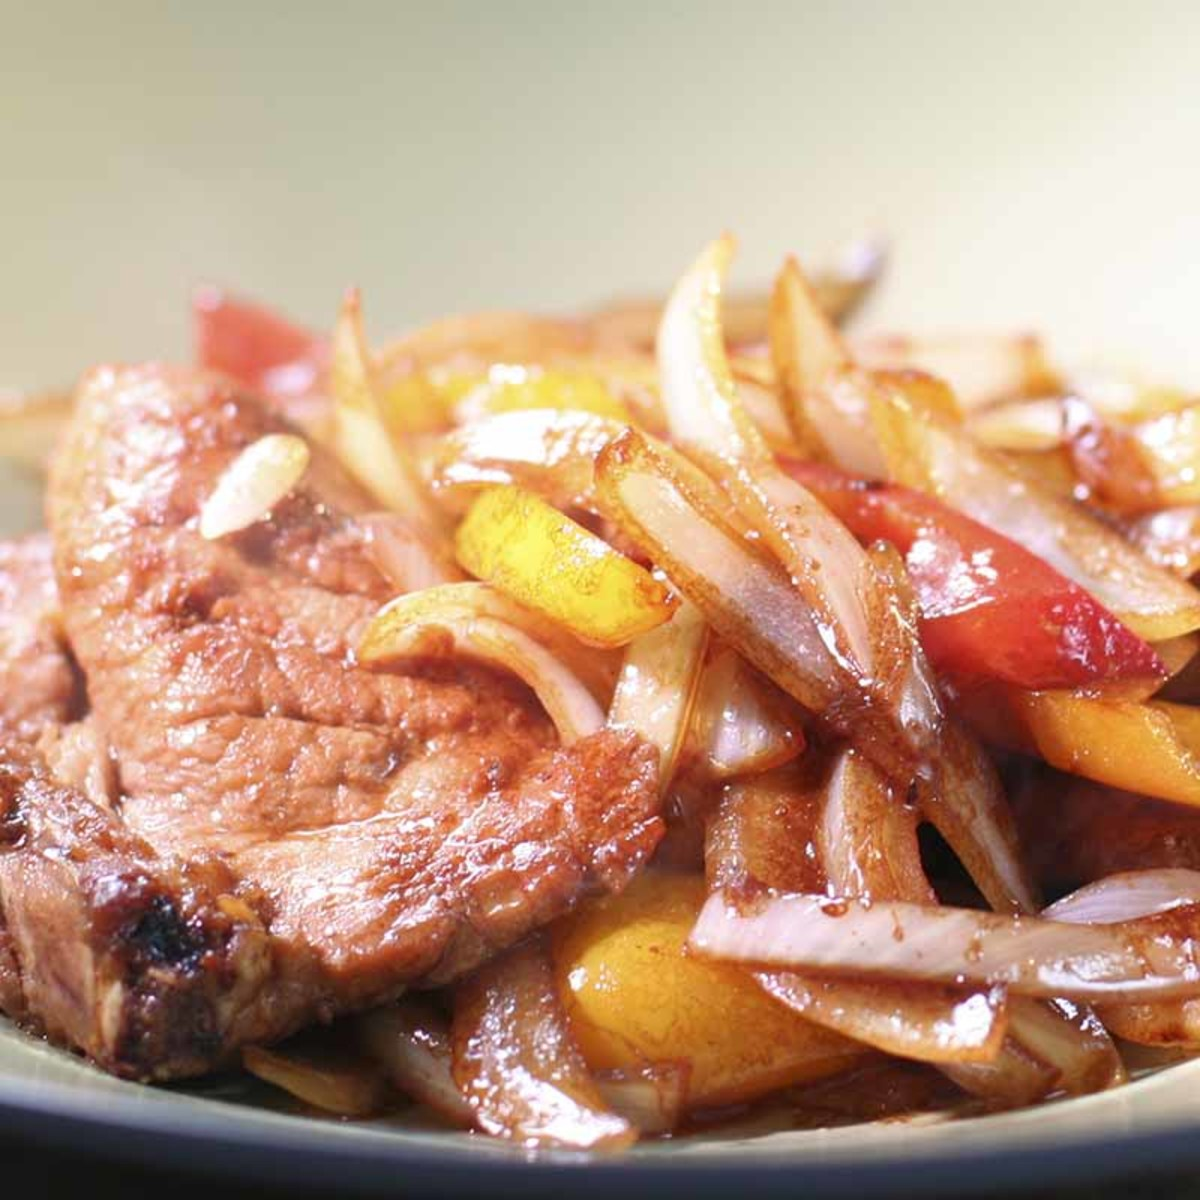 Stir Fry Japanese Onion With Pork Chop